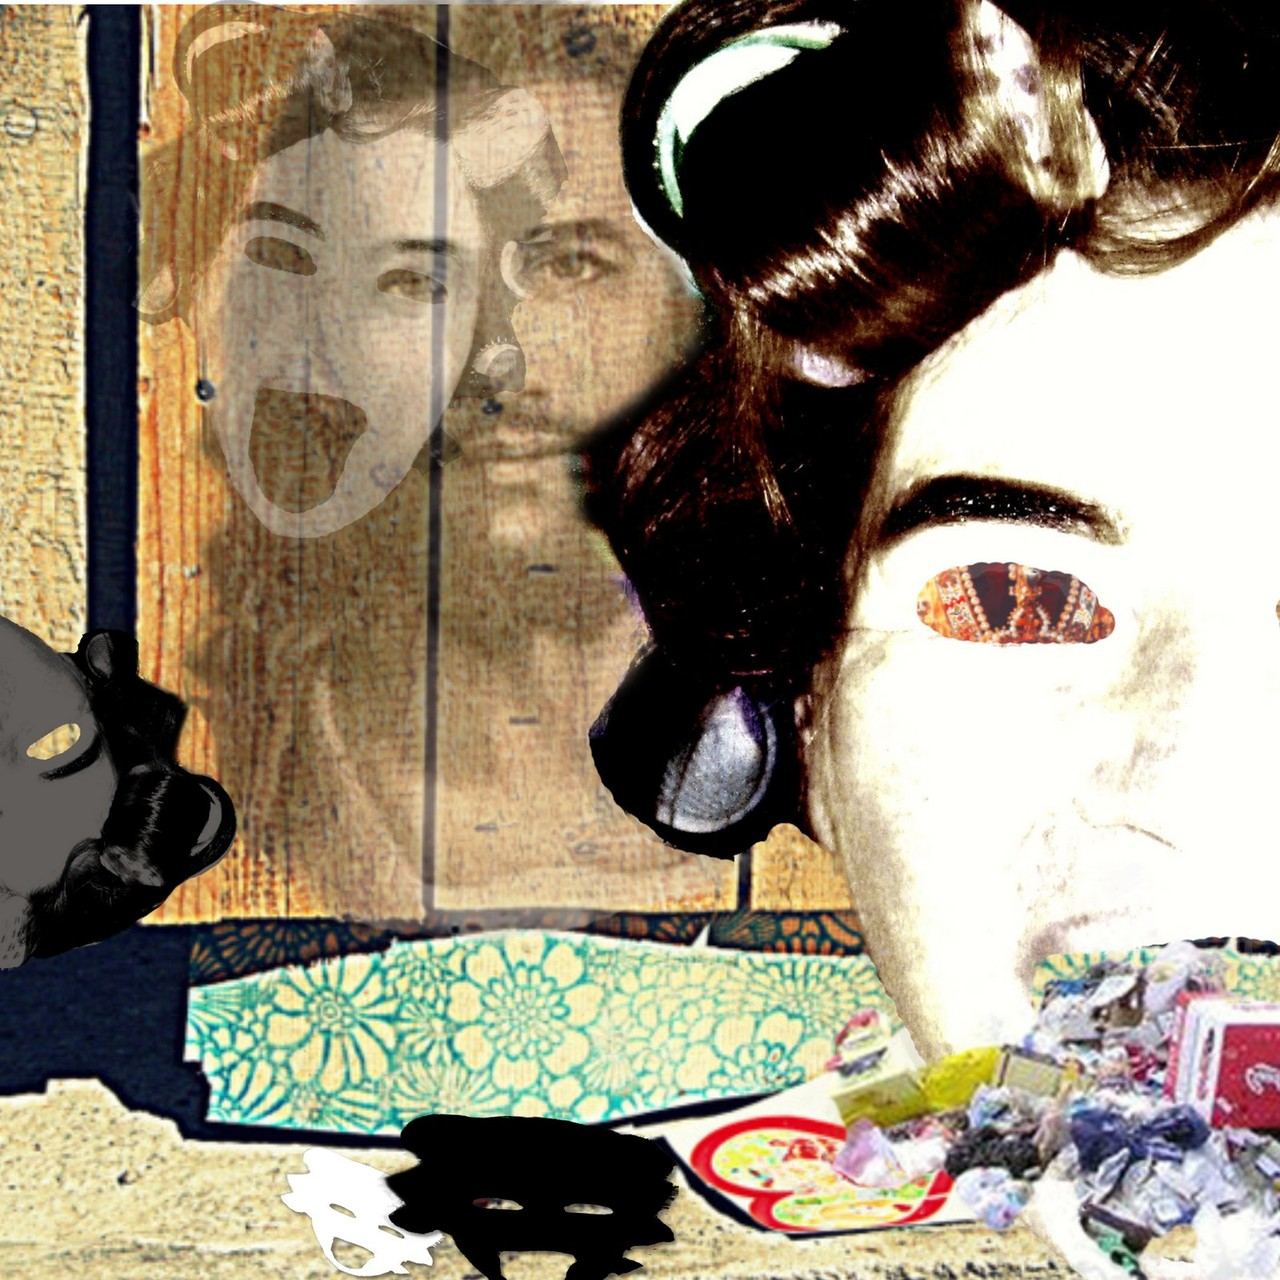 maska spada - die maske fällt 2012